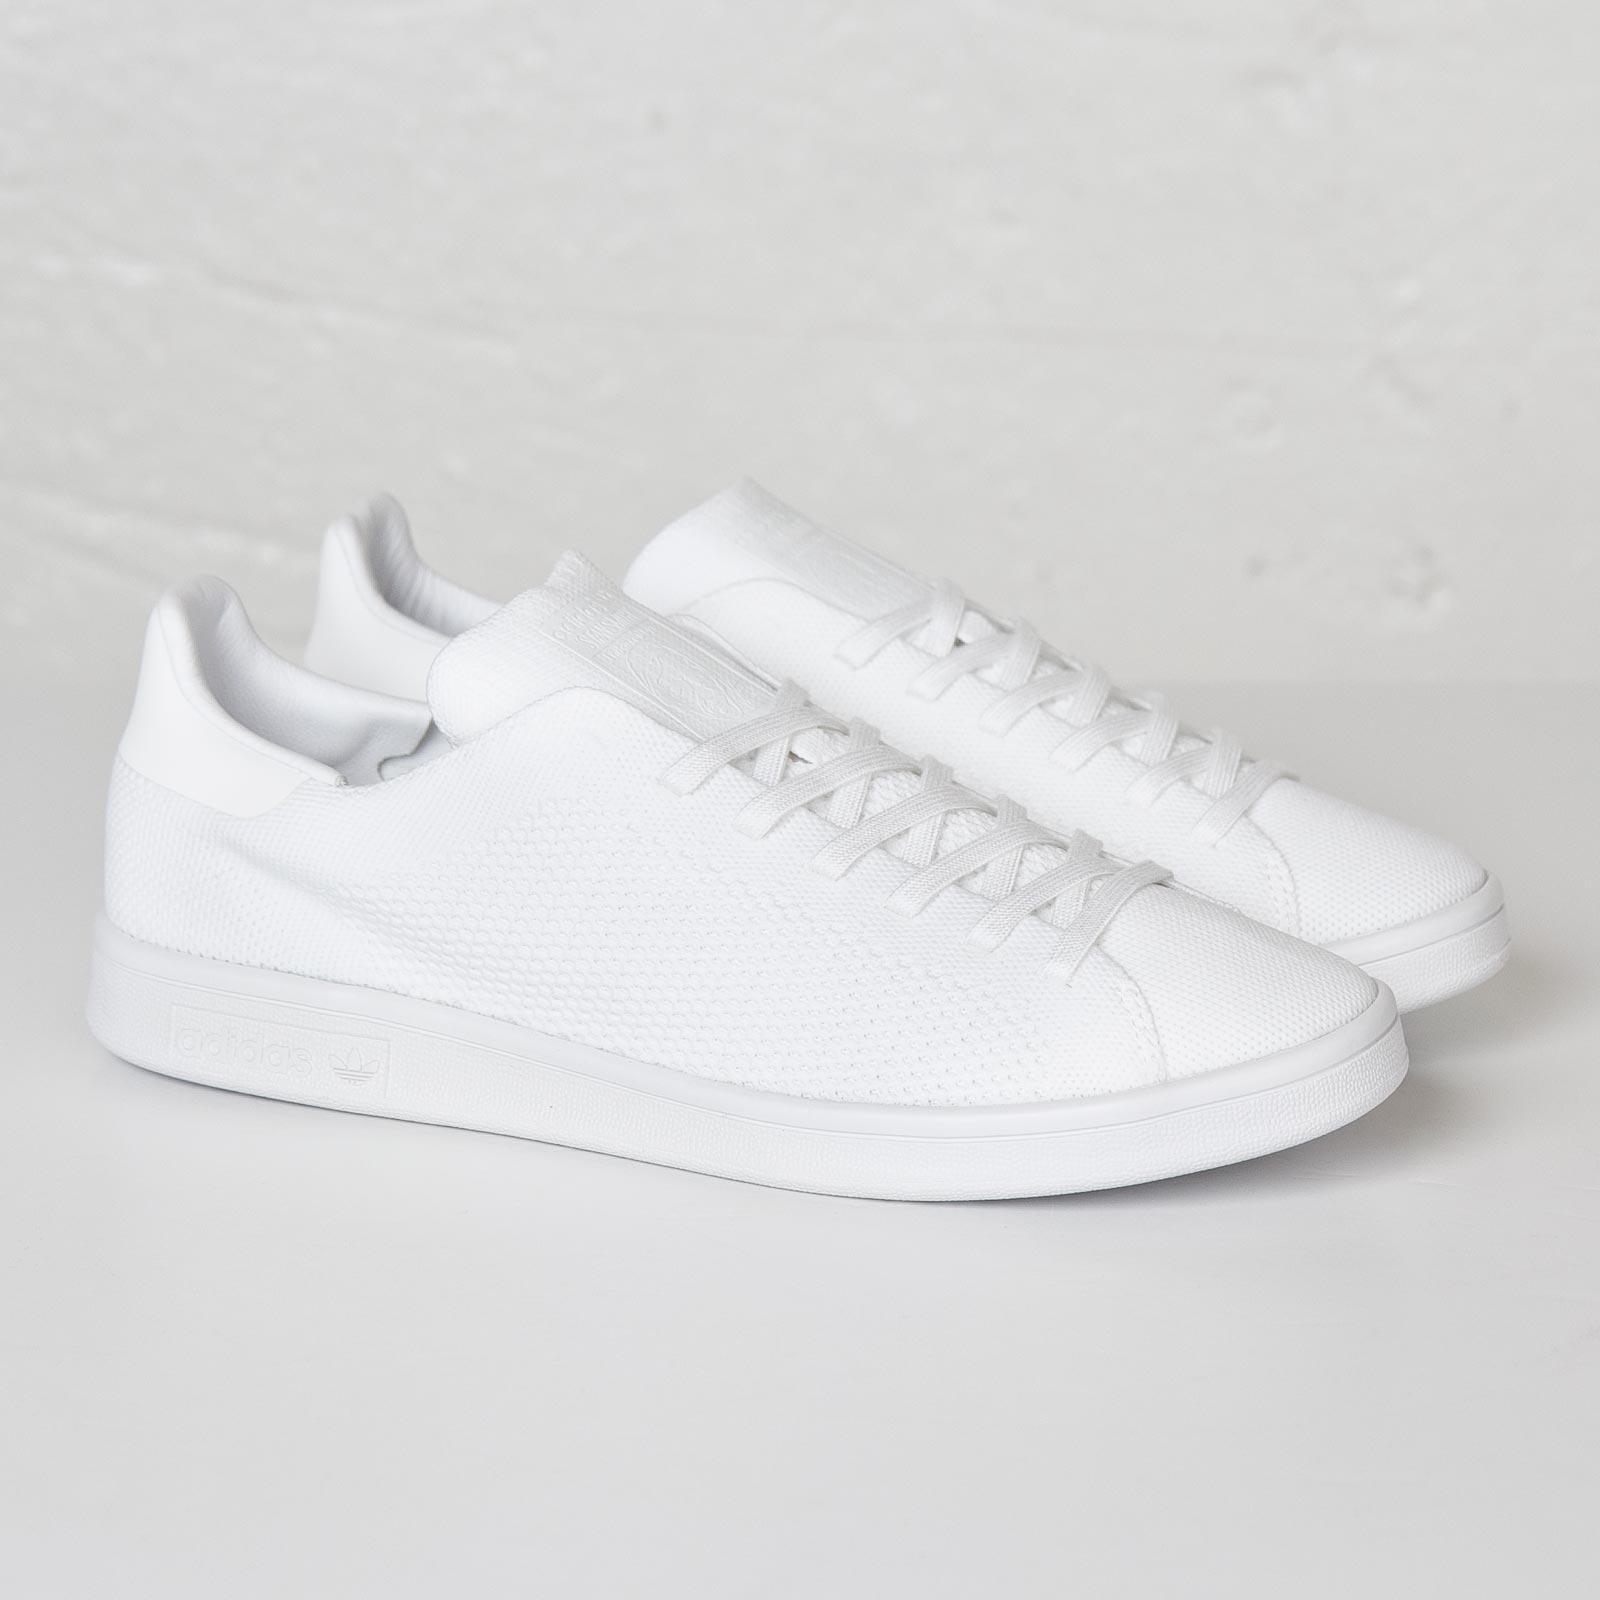 brand new e9020 1f55b adidas Stan Smith - Primeknit - Af4451 - Sneakersnstuff ...